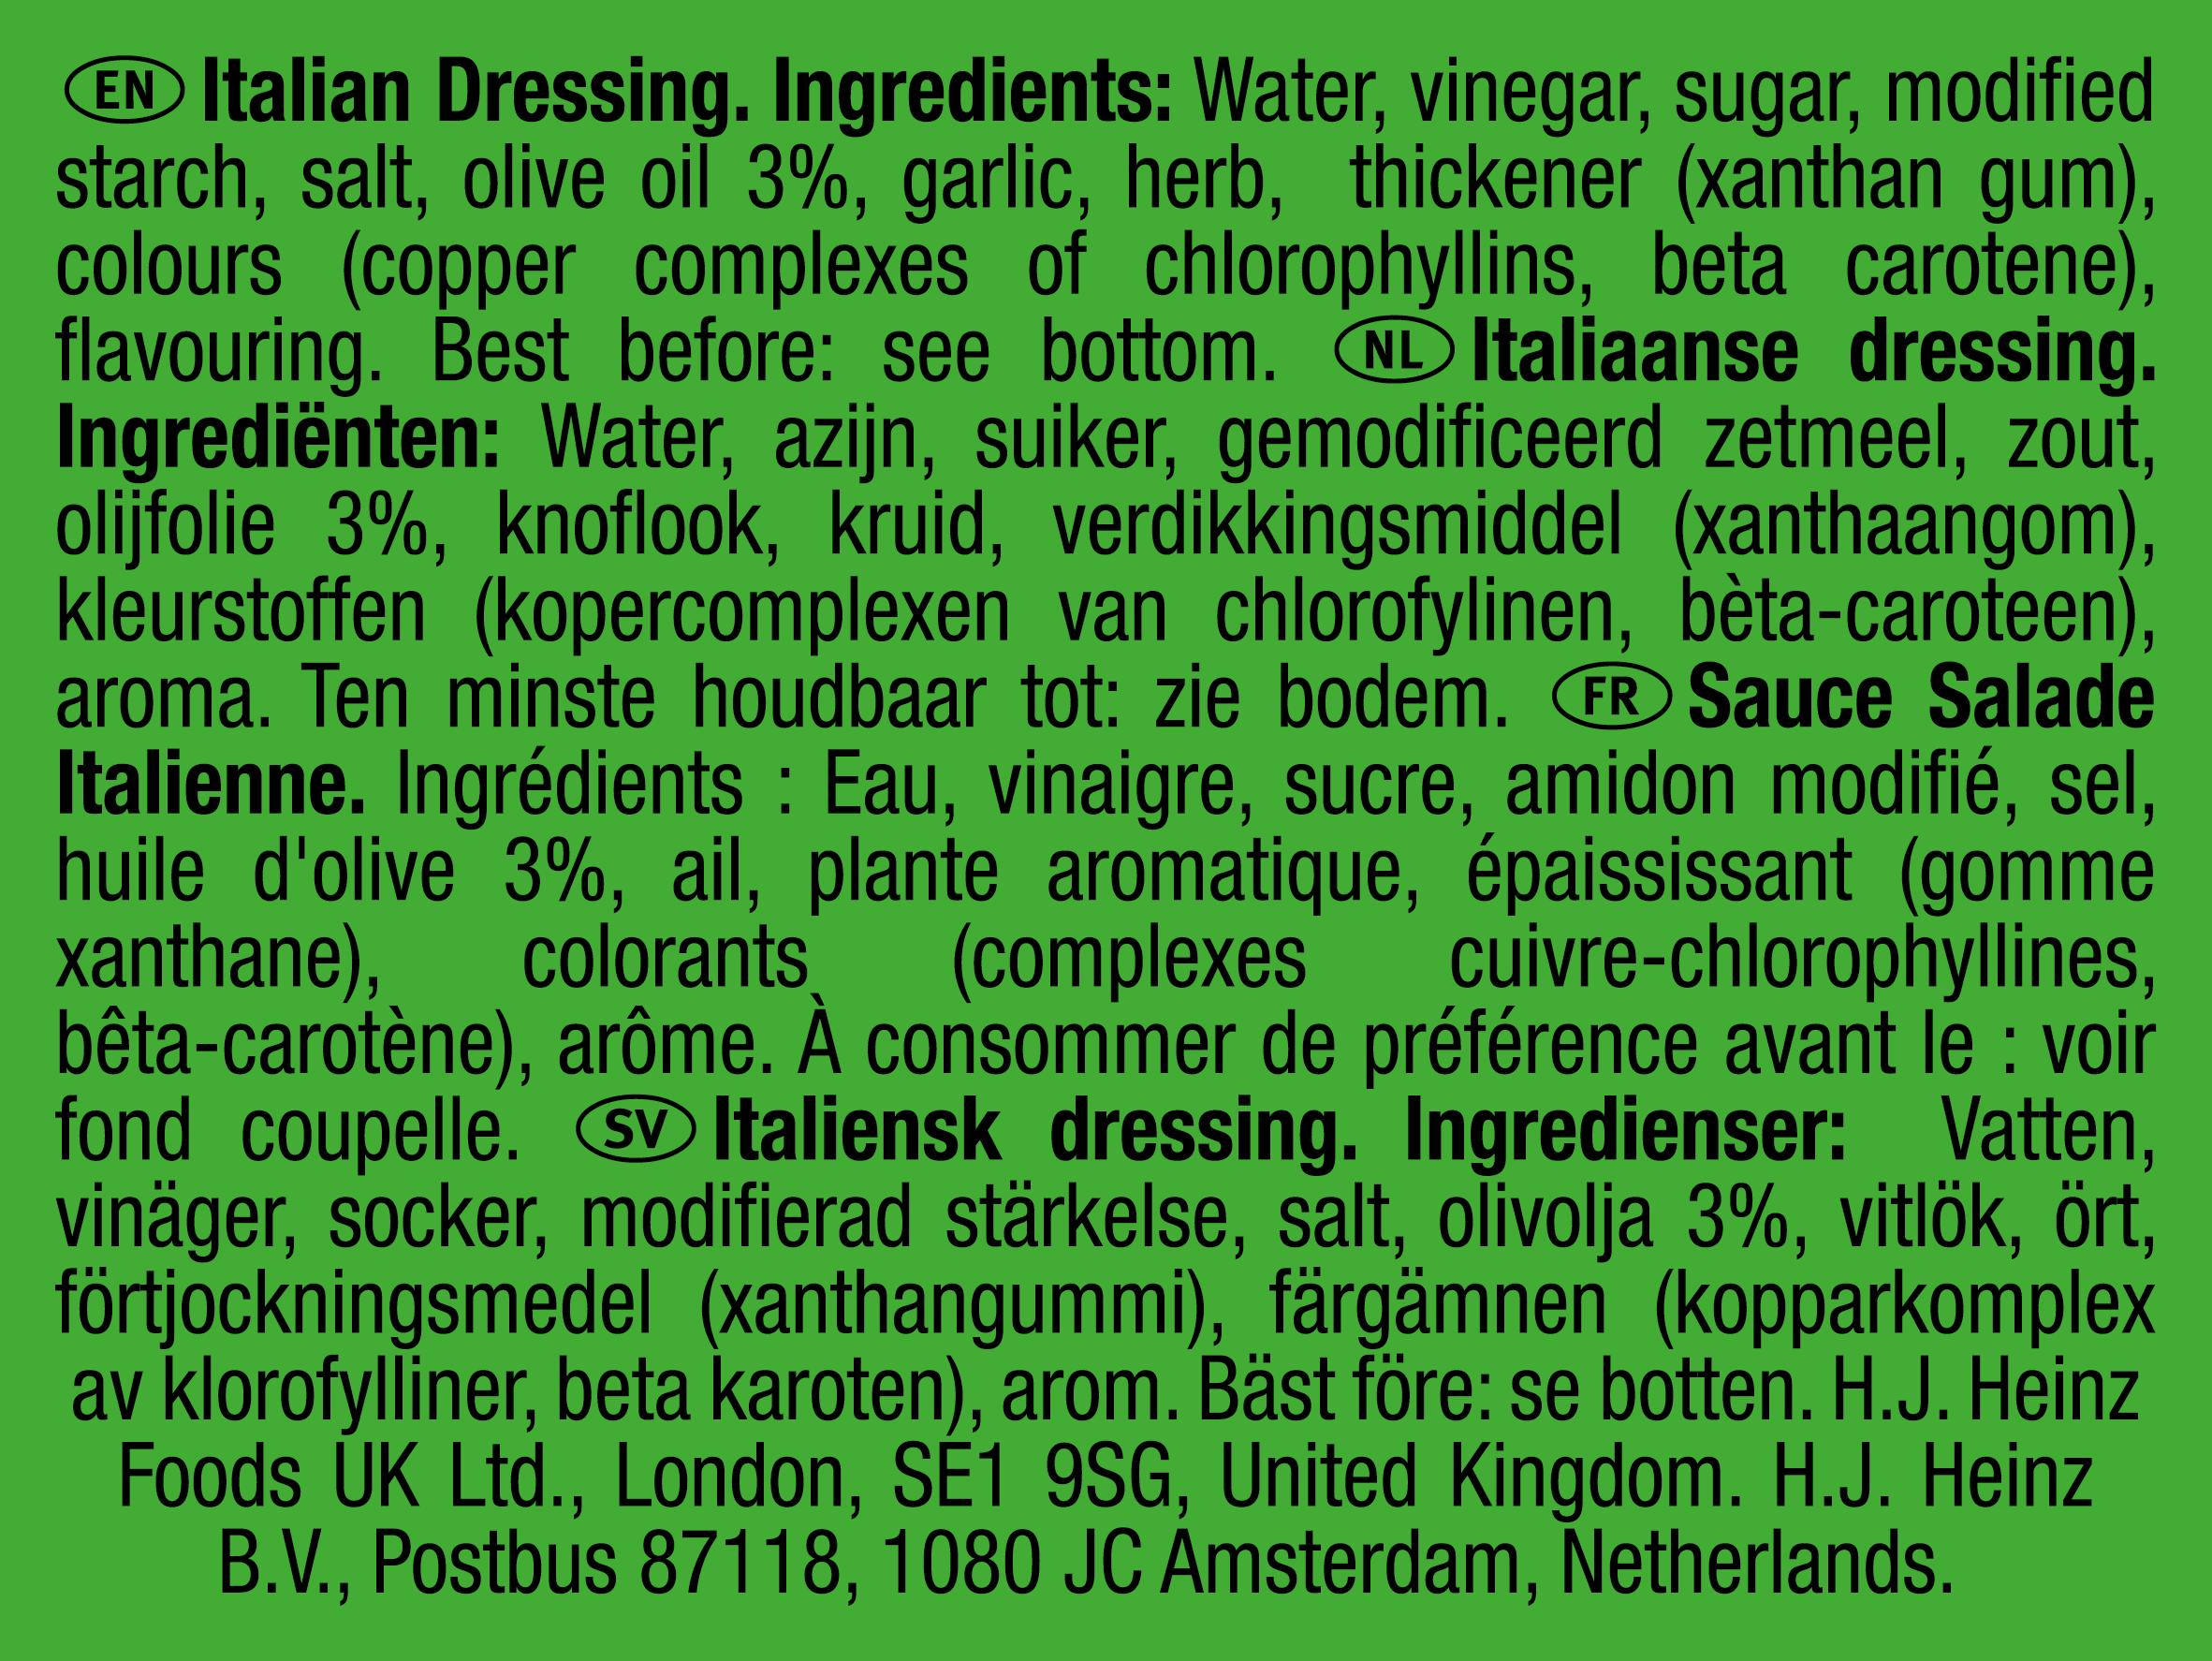 Heinz Italian Dressing dippot 25ml